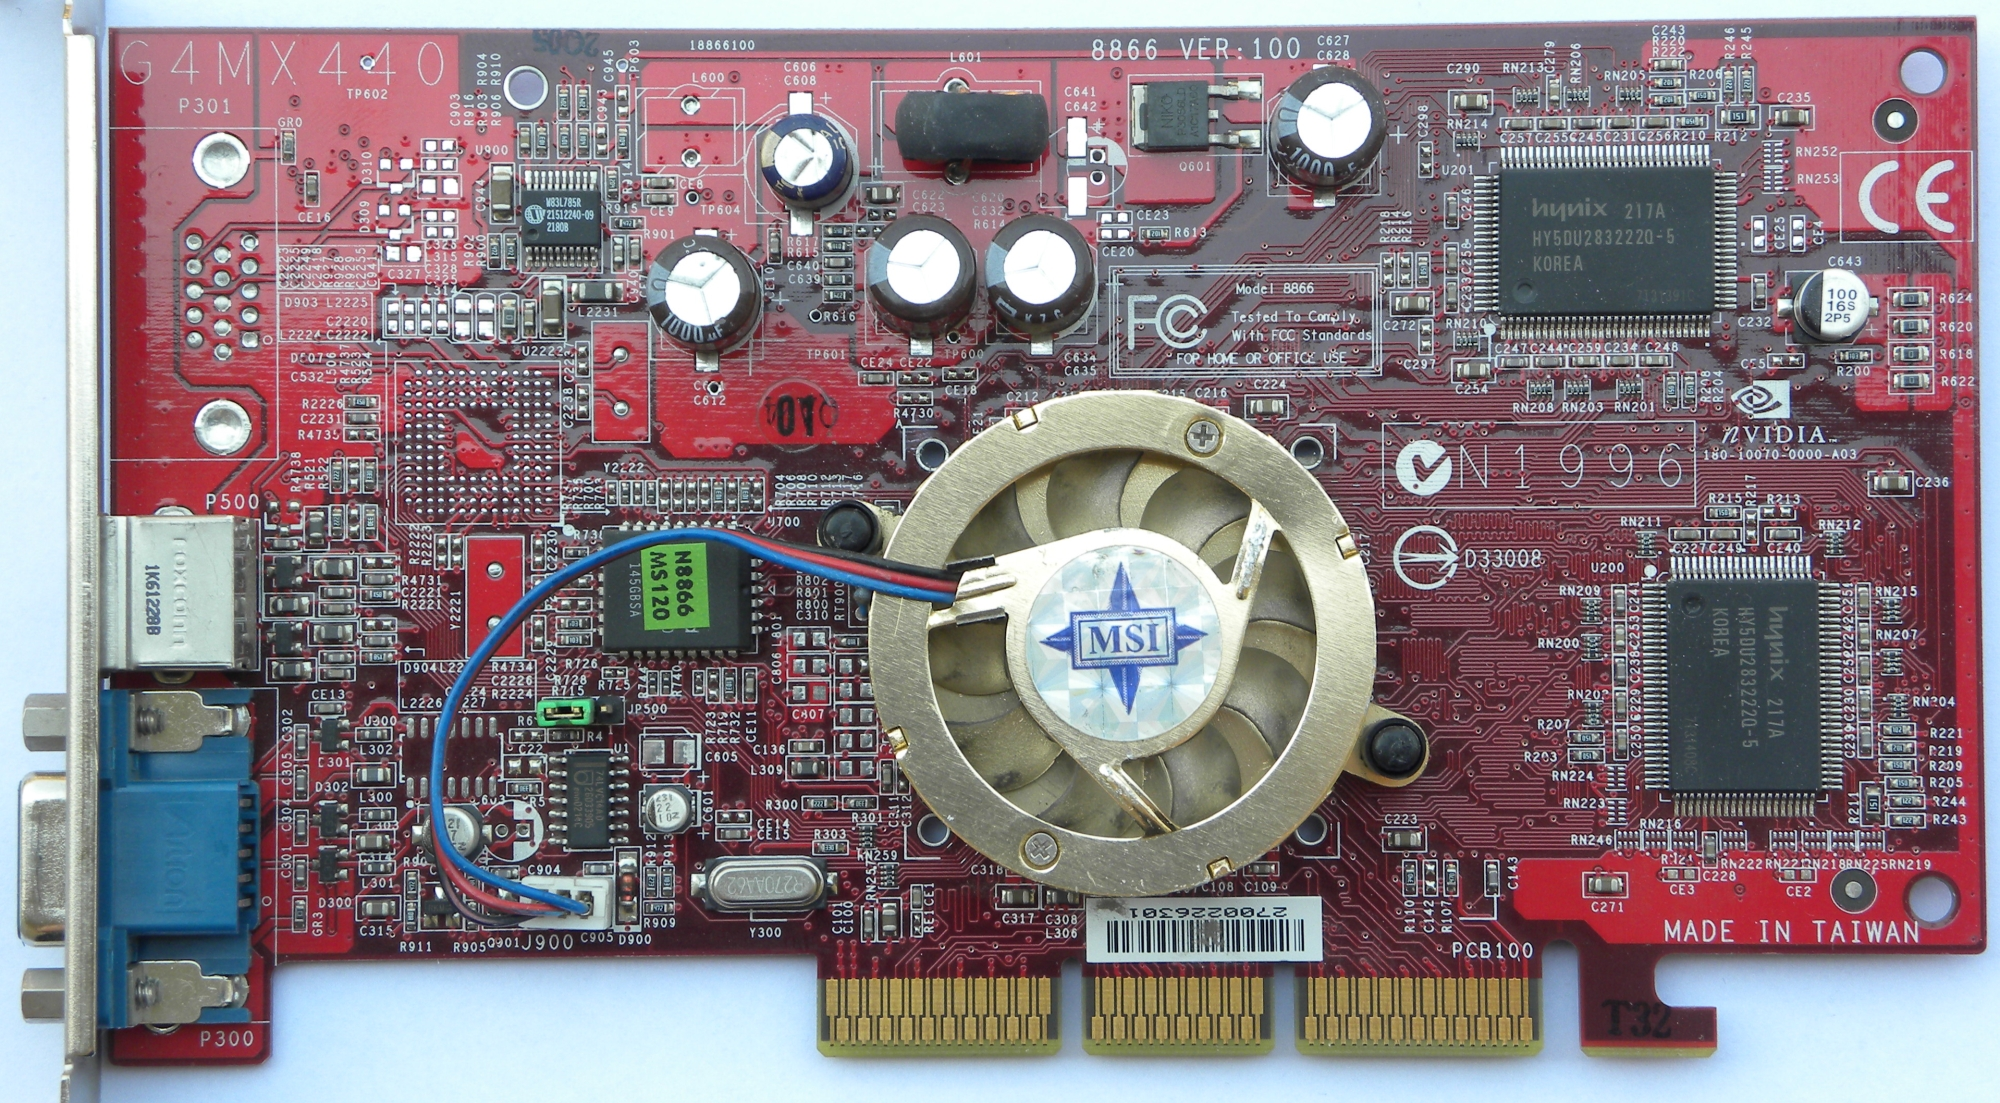 NVIDIA GeForce4 MX 440 Driver